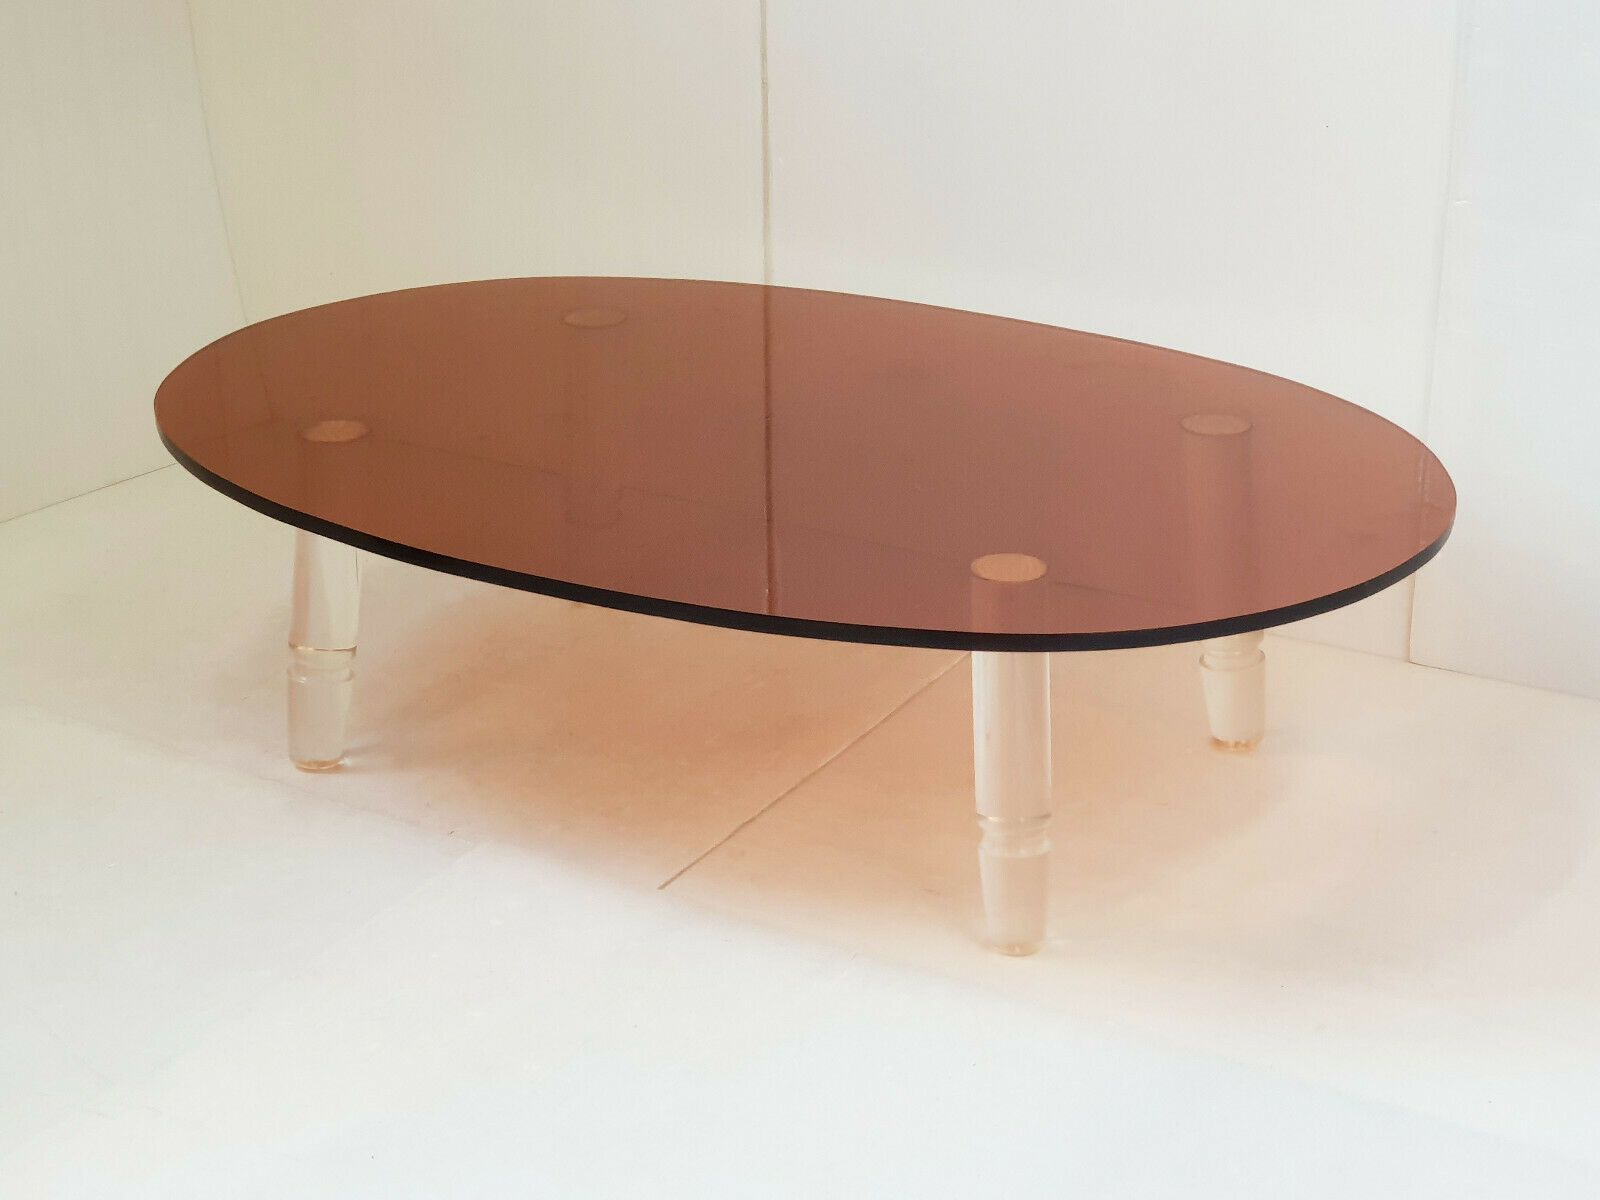 Magnificent 1970 Vintage Coffee Table In Smoked Transparent 70s Plexiglas Coffee Table Vintage Retro Coffee Tables Coffee Table [ 1200 x 1600 Pixel ]